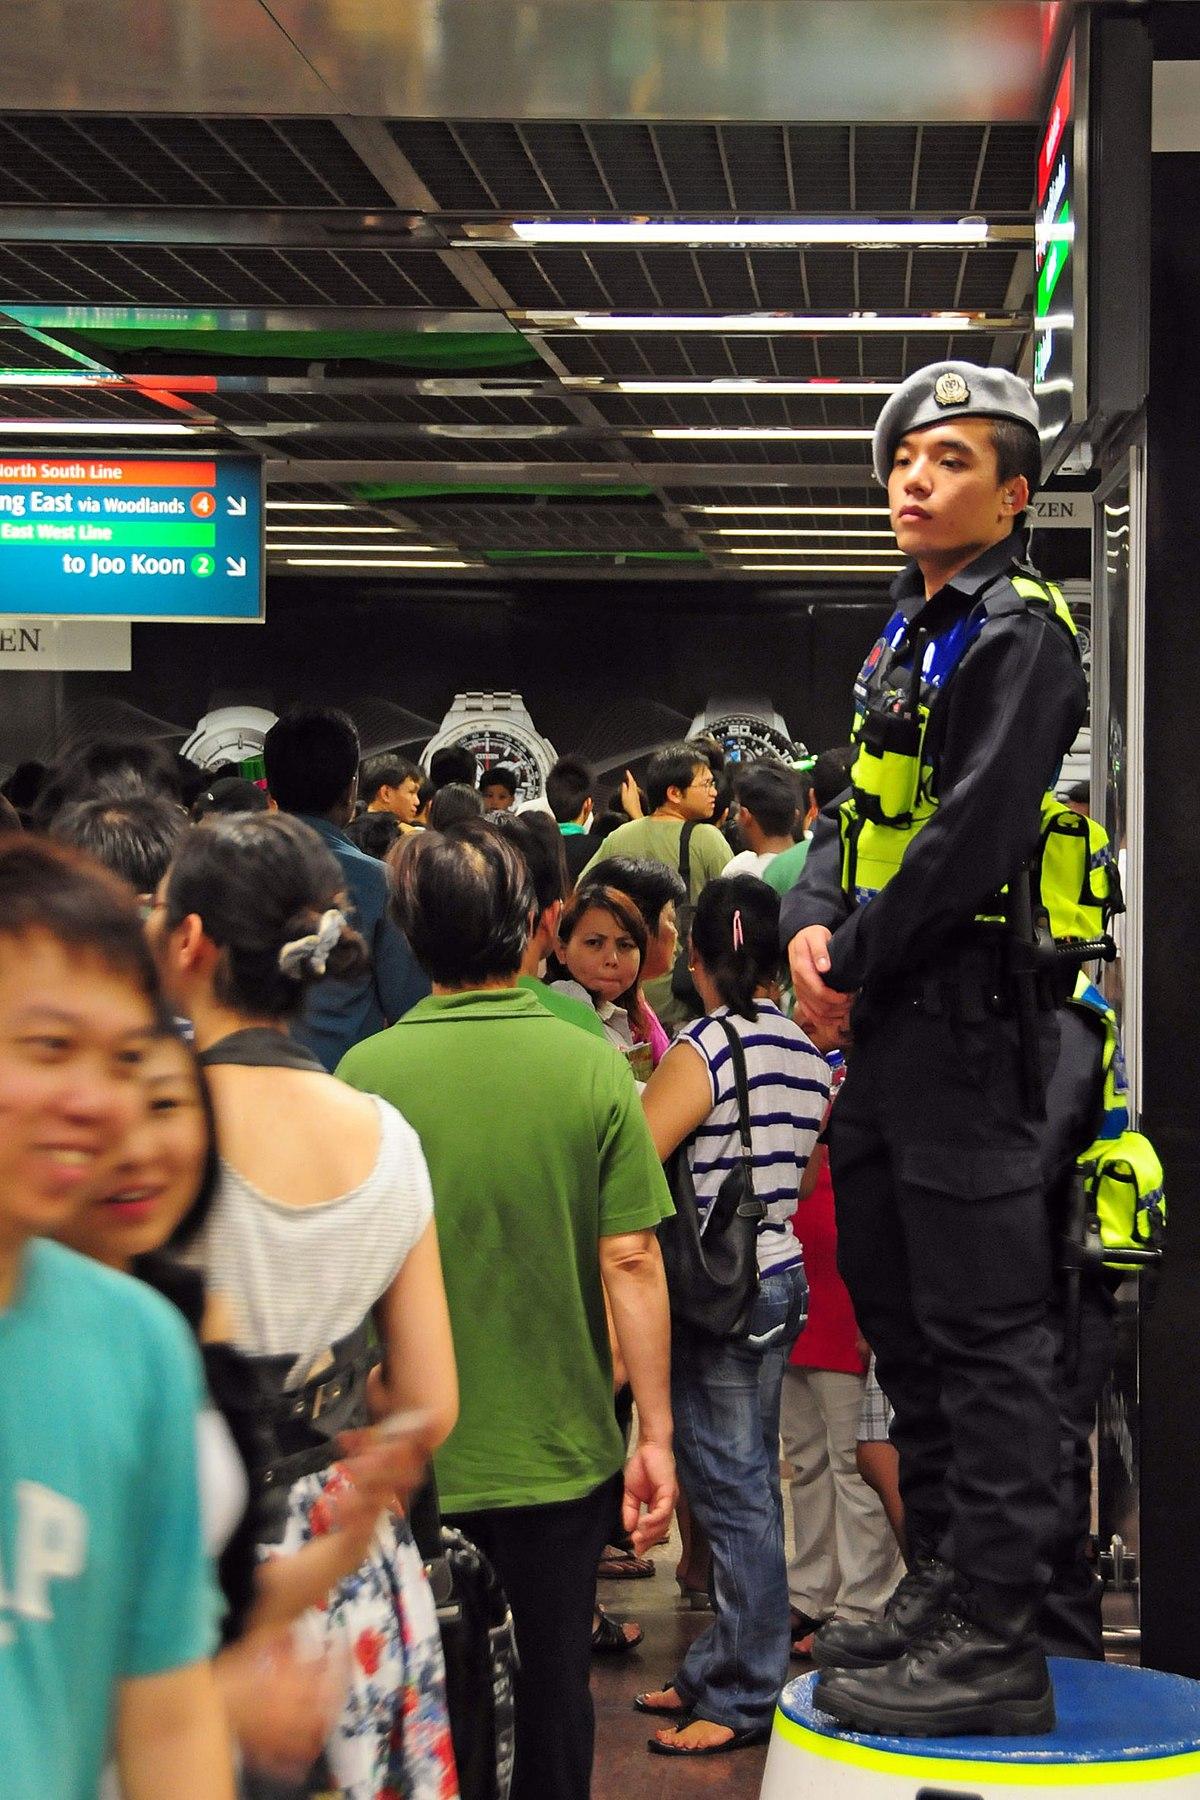 Public Transport Security